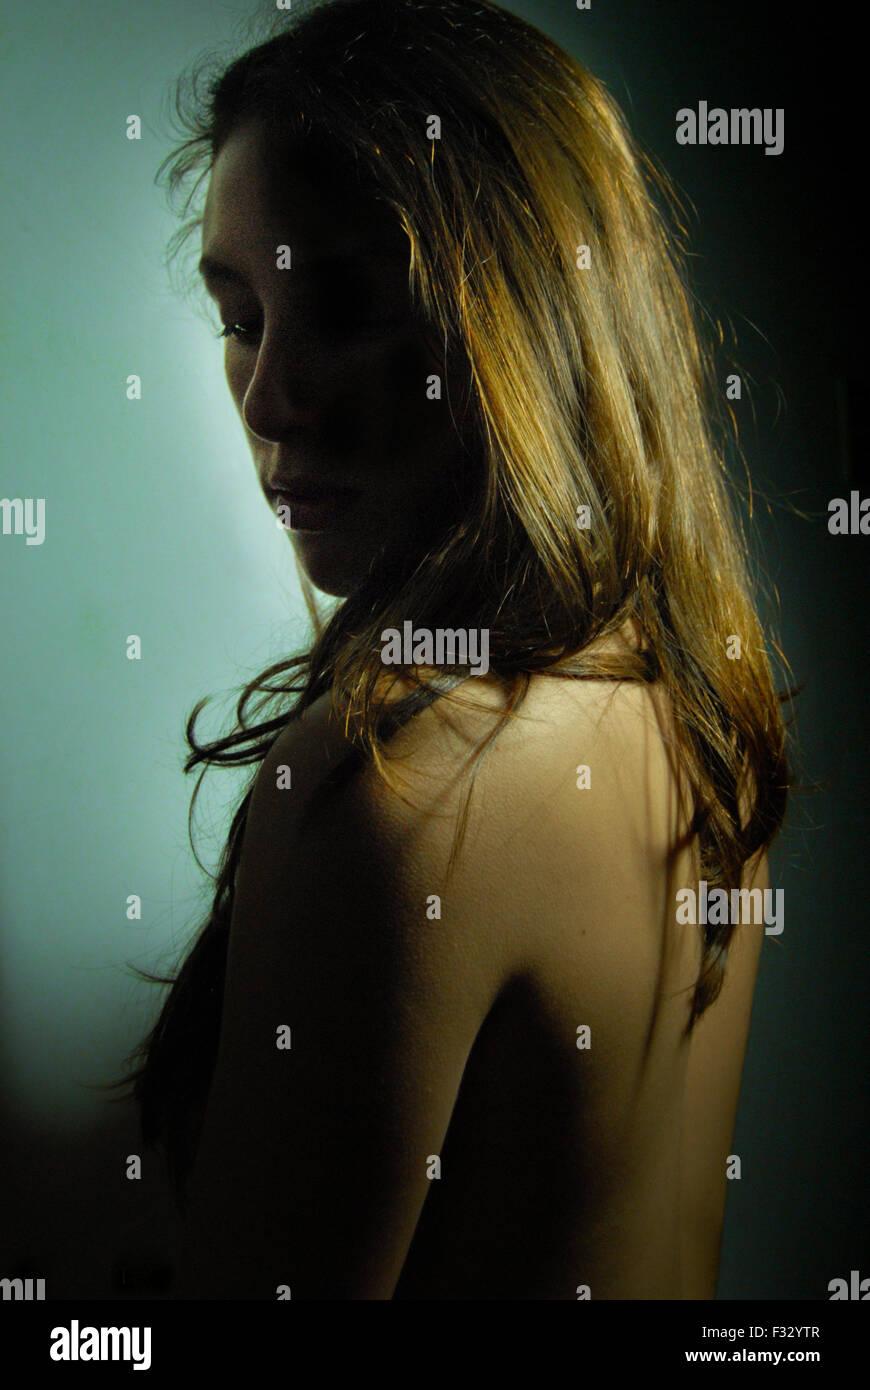 Girl showing her back, skin beautiful light - Stock Image